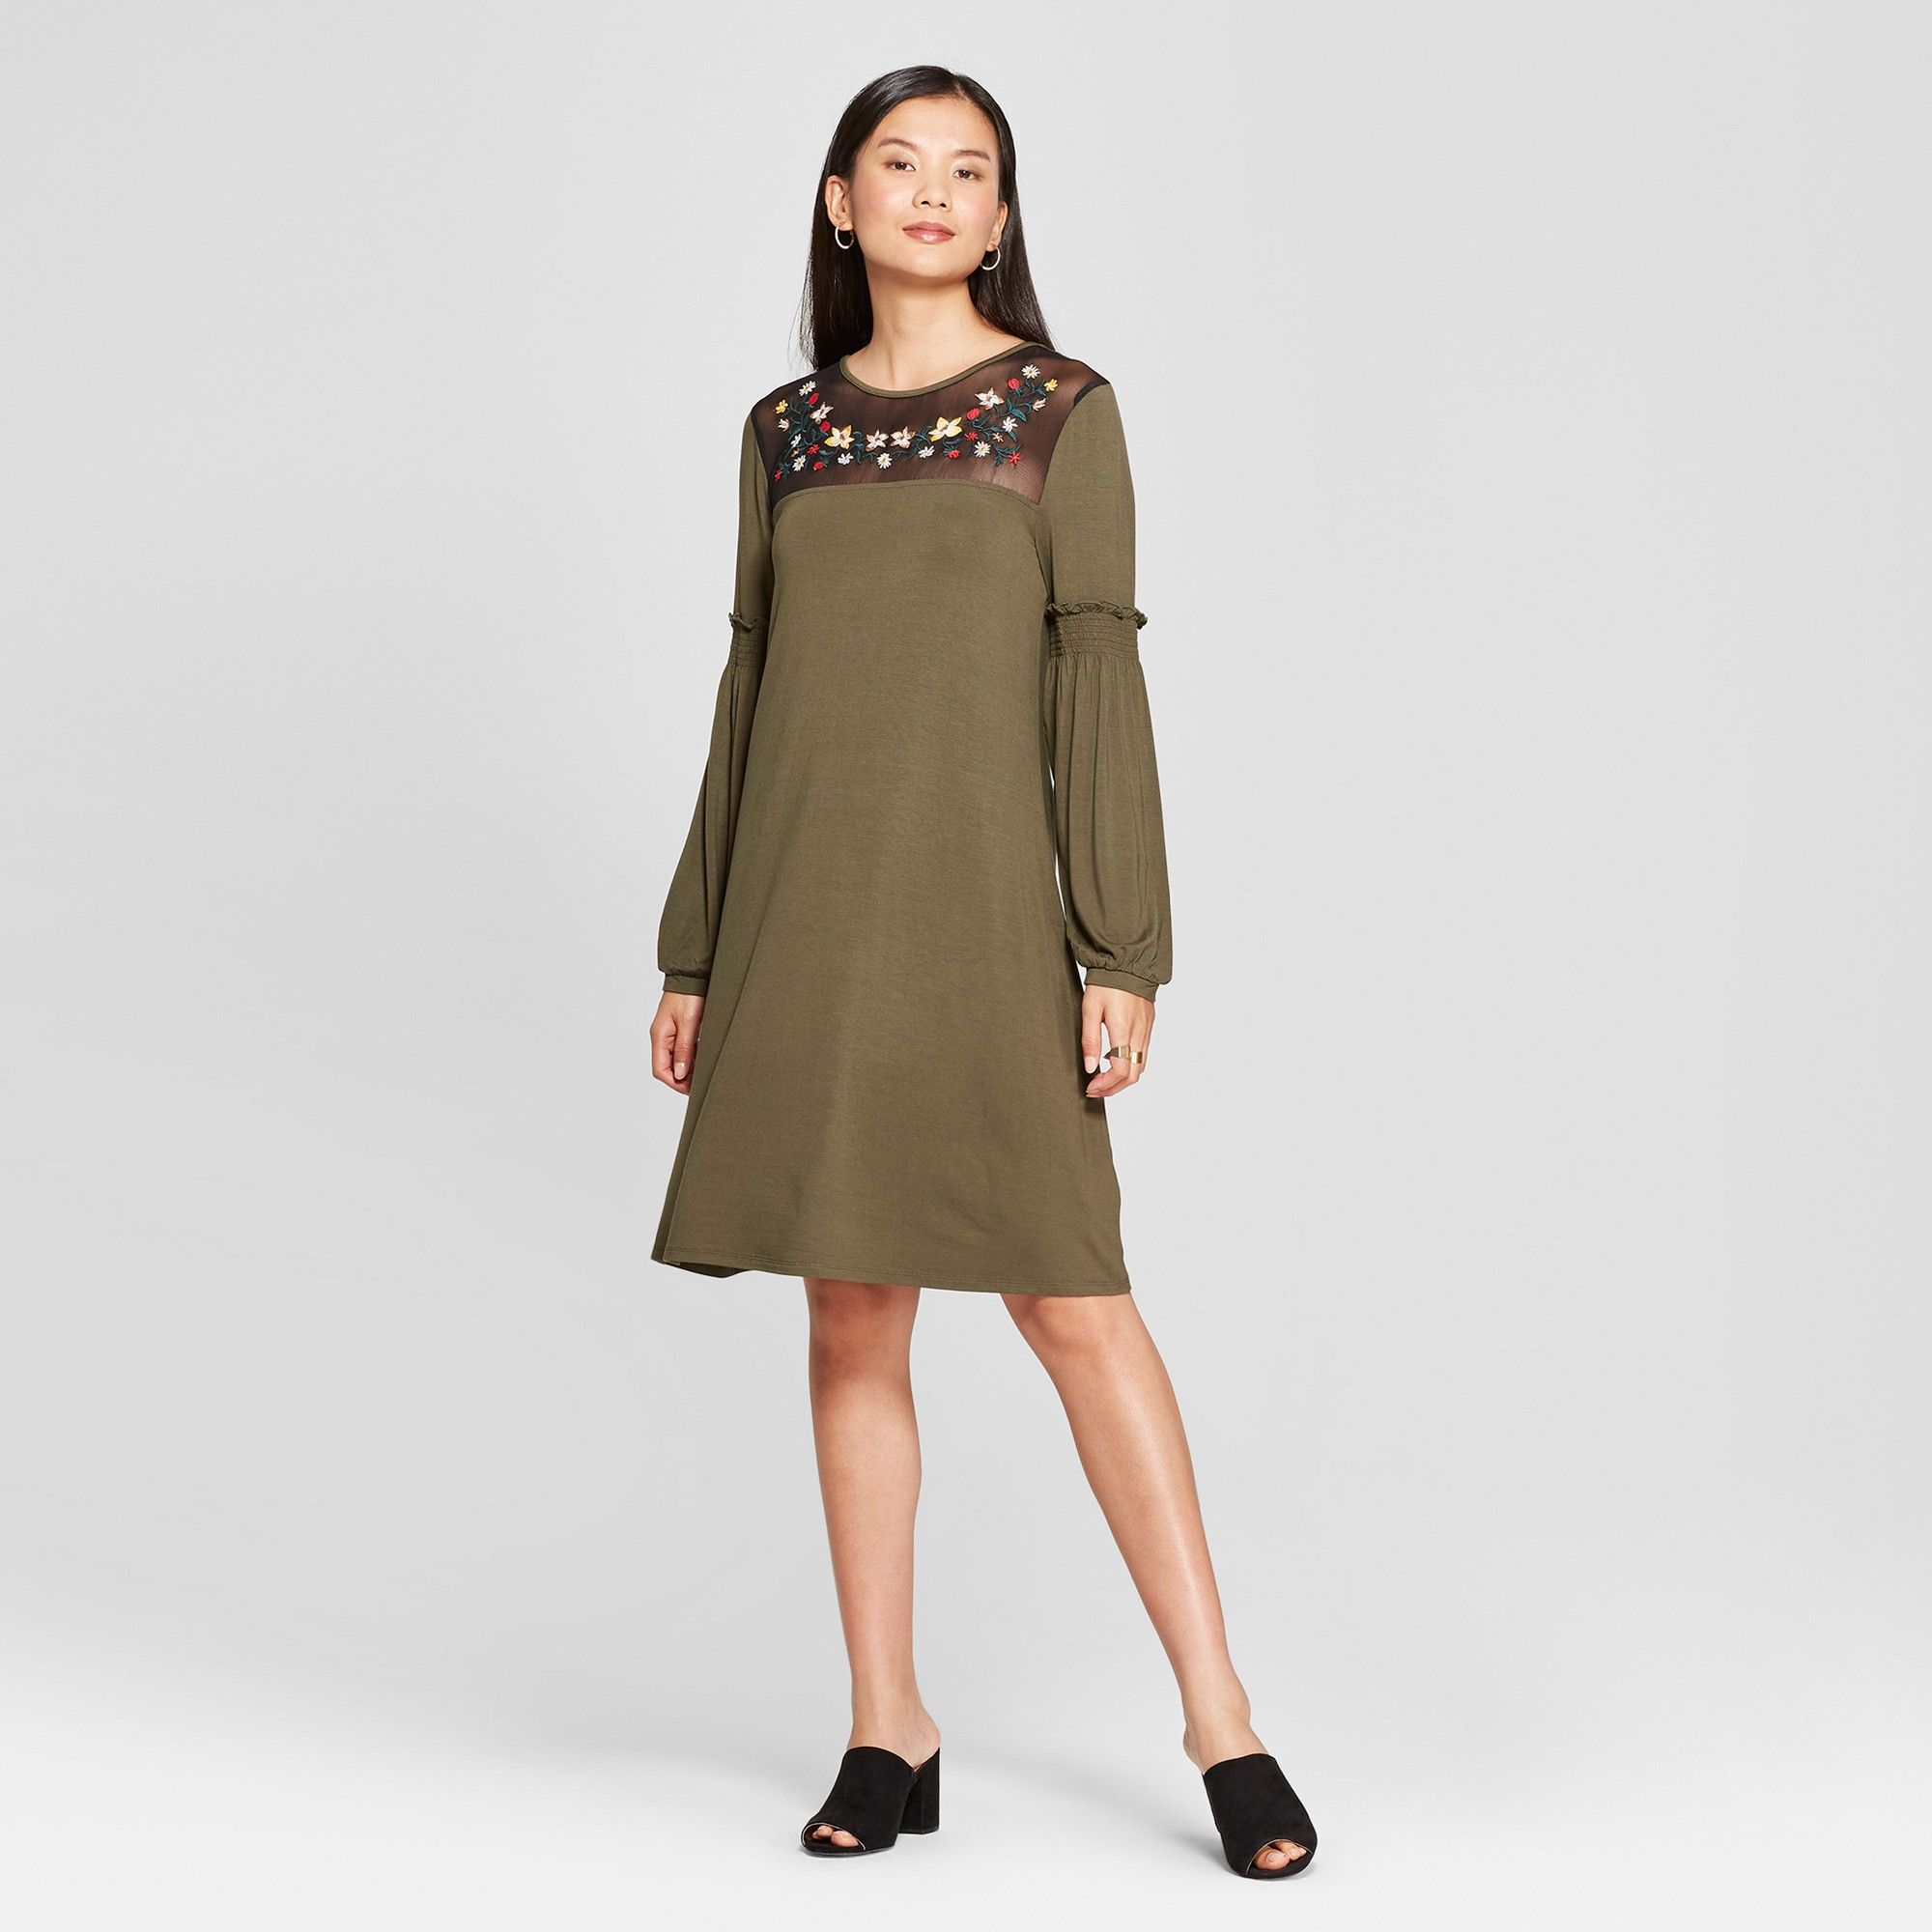 48d7ed3c7649 Women's Embroidered Yoke Knit Shift Dress - Spenser Jeremy - Olive XL, Green